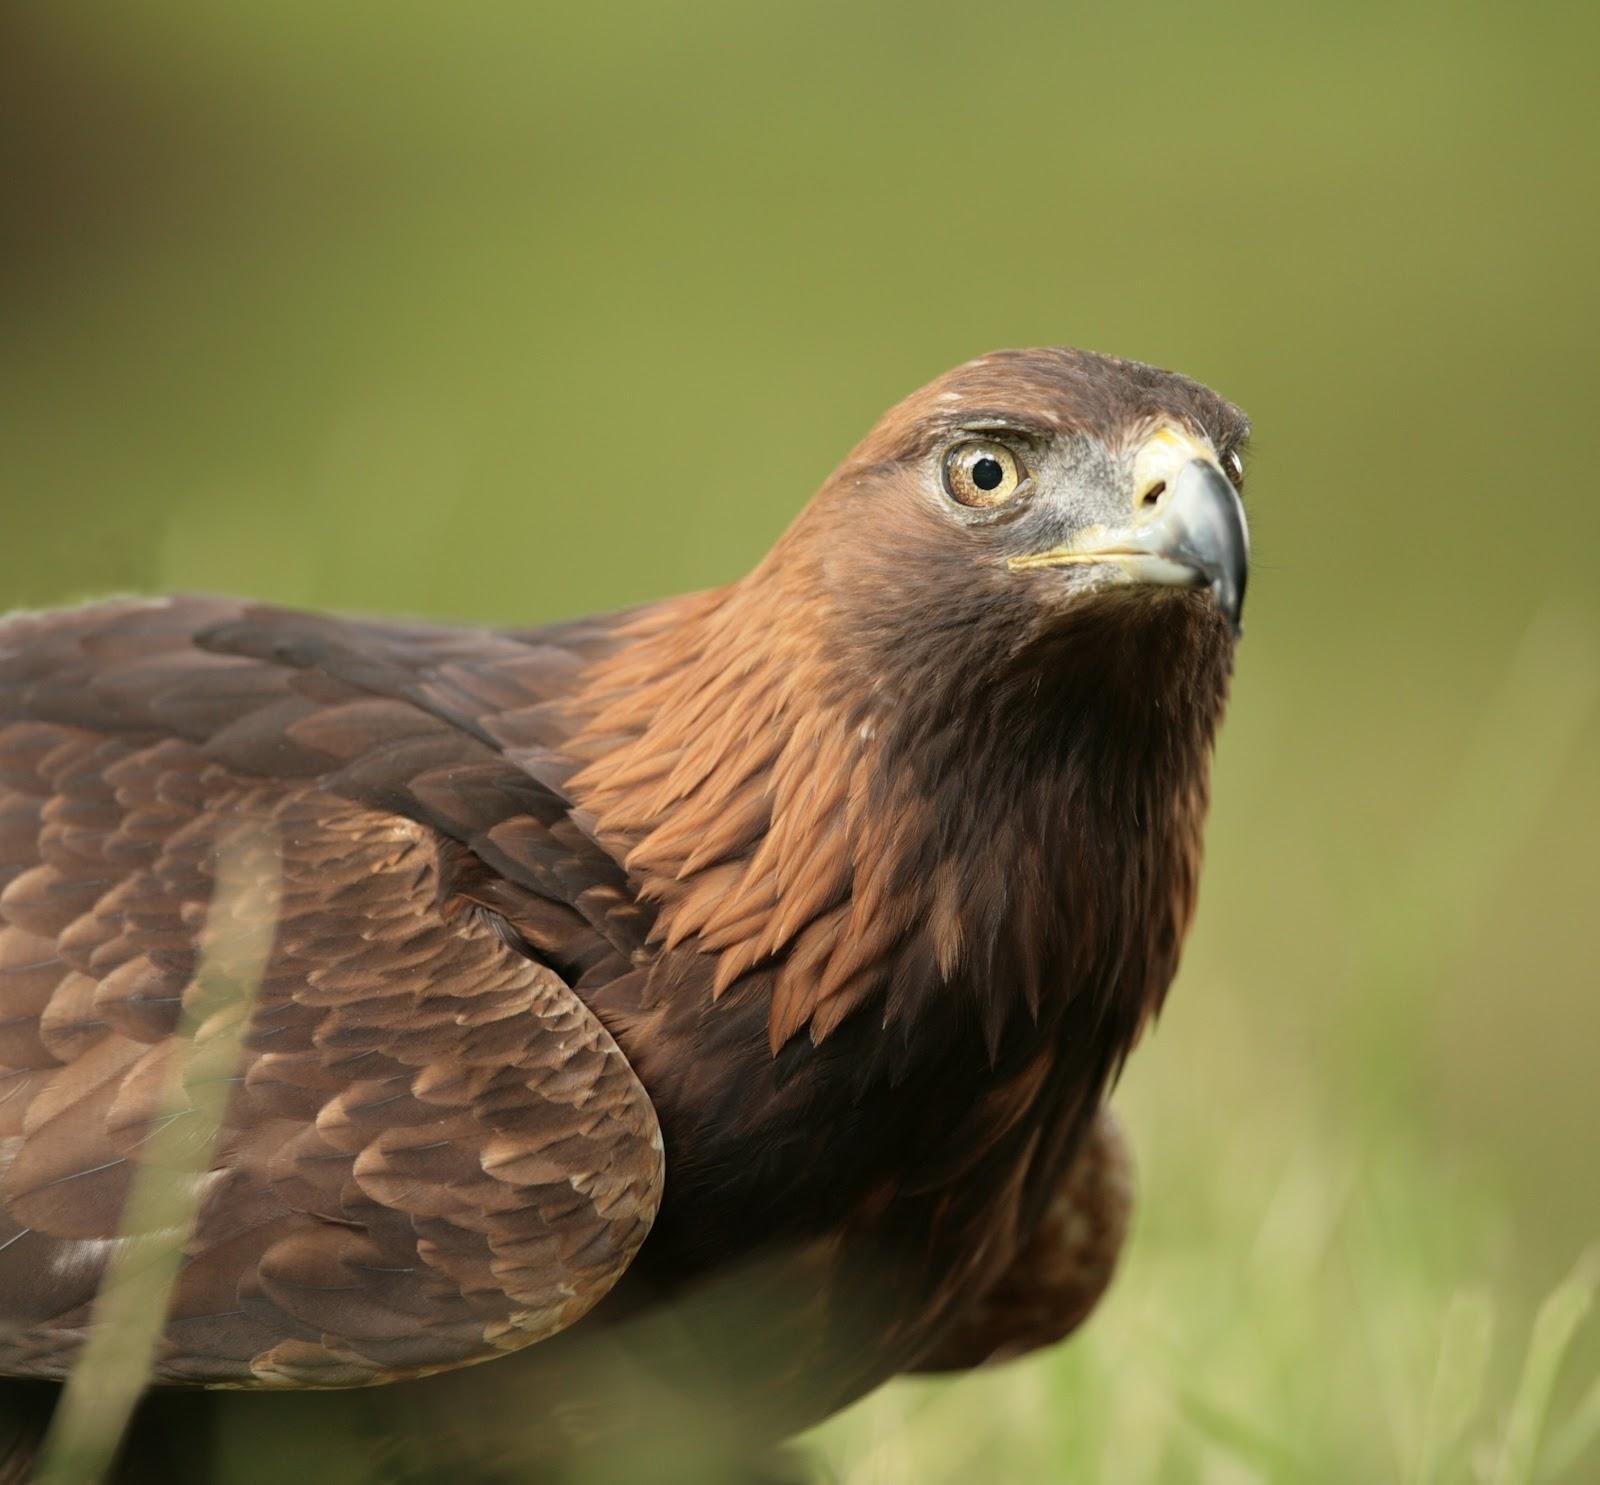 golden eagle Golden eagle charter school 2405 s mt shasta blvd, #3 mt shasta, ca  96067 view map & directions phone: (530) 926-5800 fax: (530) 926-5826.